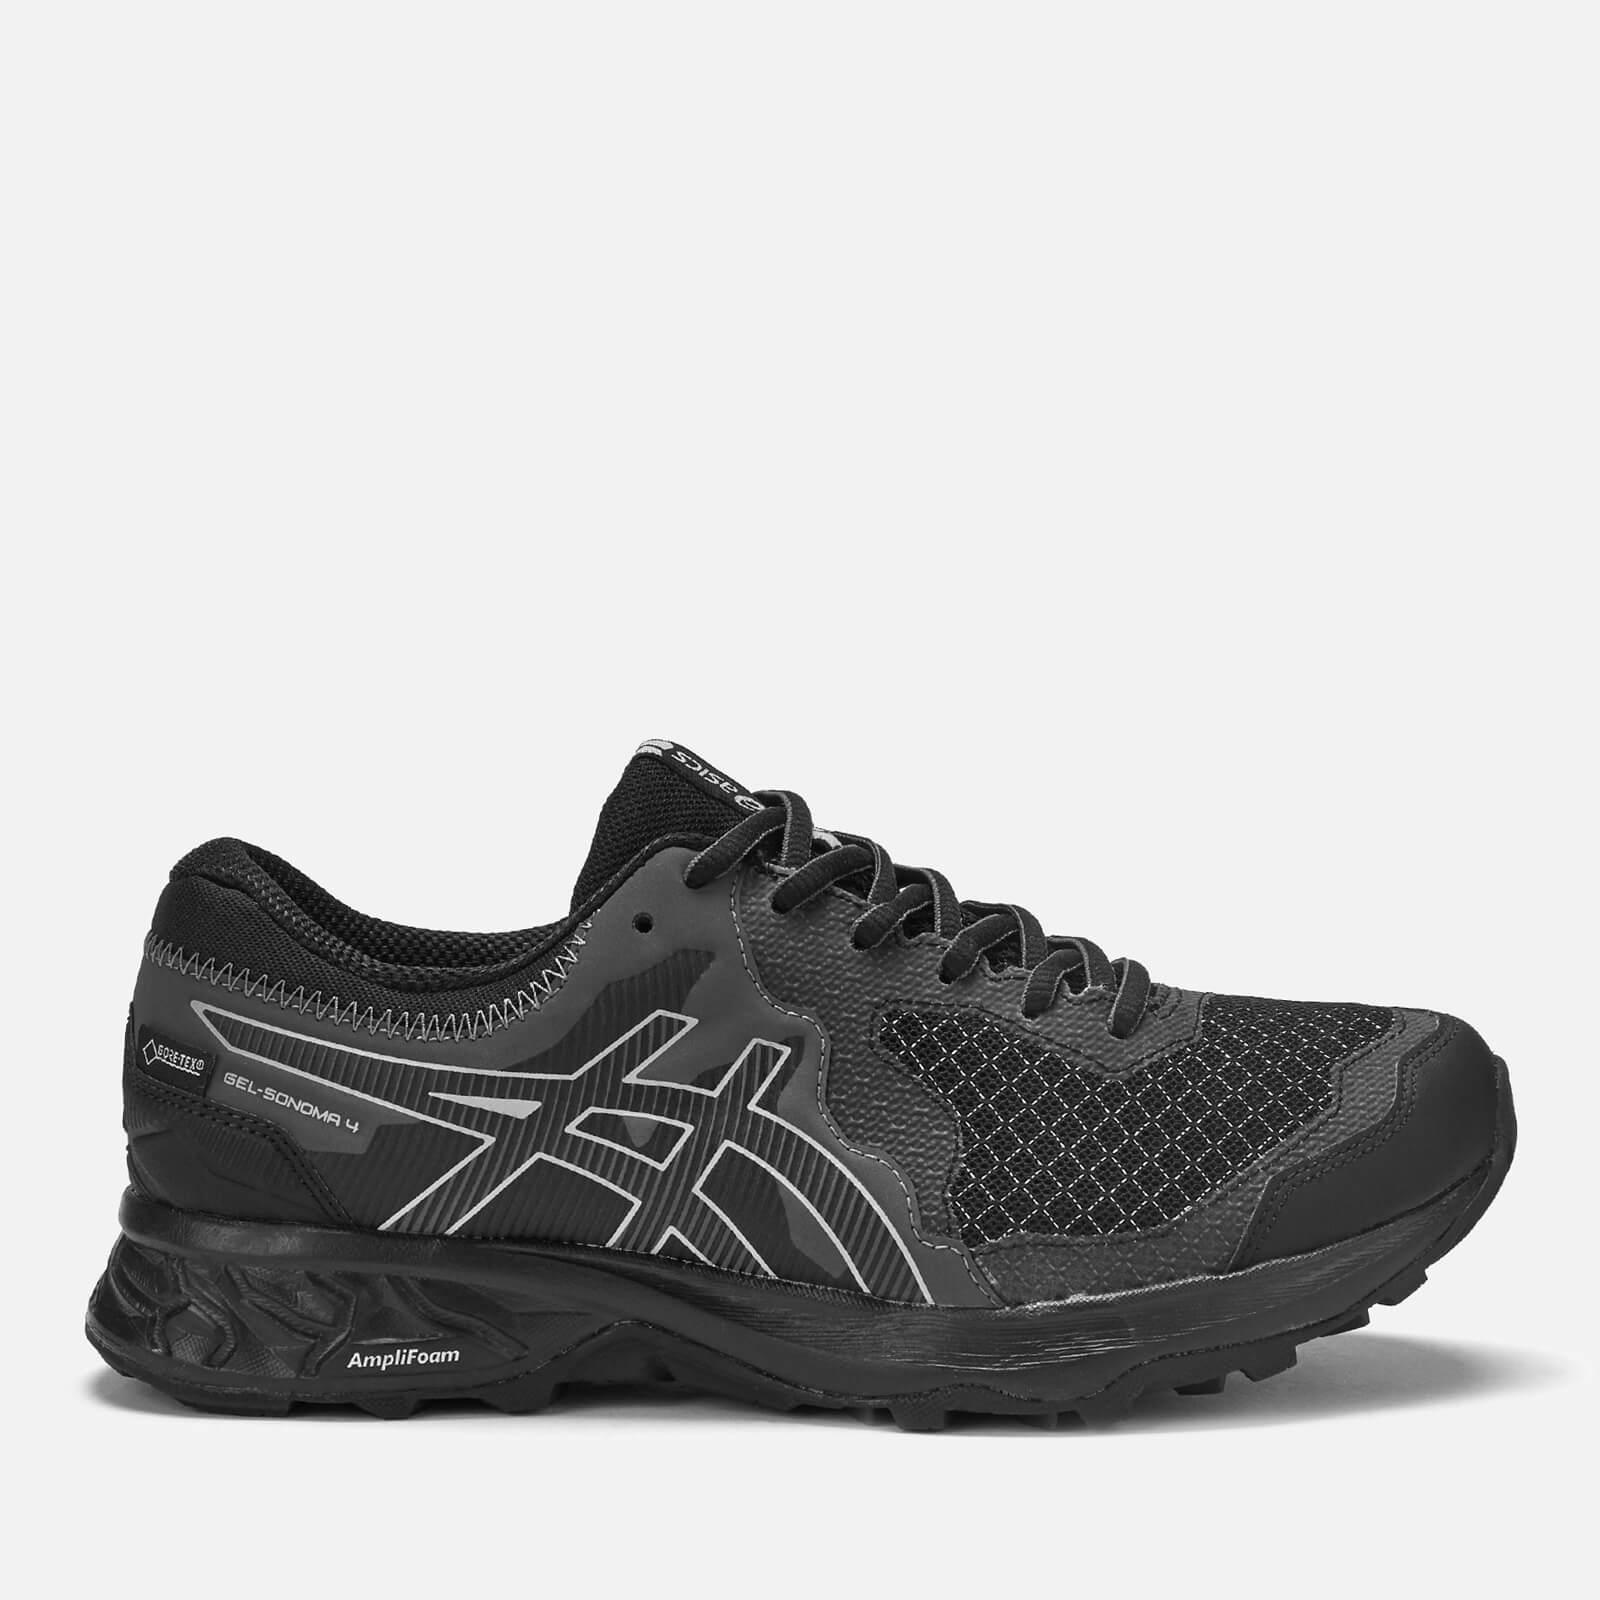 Asics Women's Running Trail Gel Somoma 4 Goretex Trainers - Black/Stone Grey - UK 4 - Black